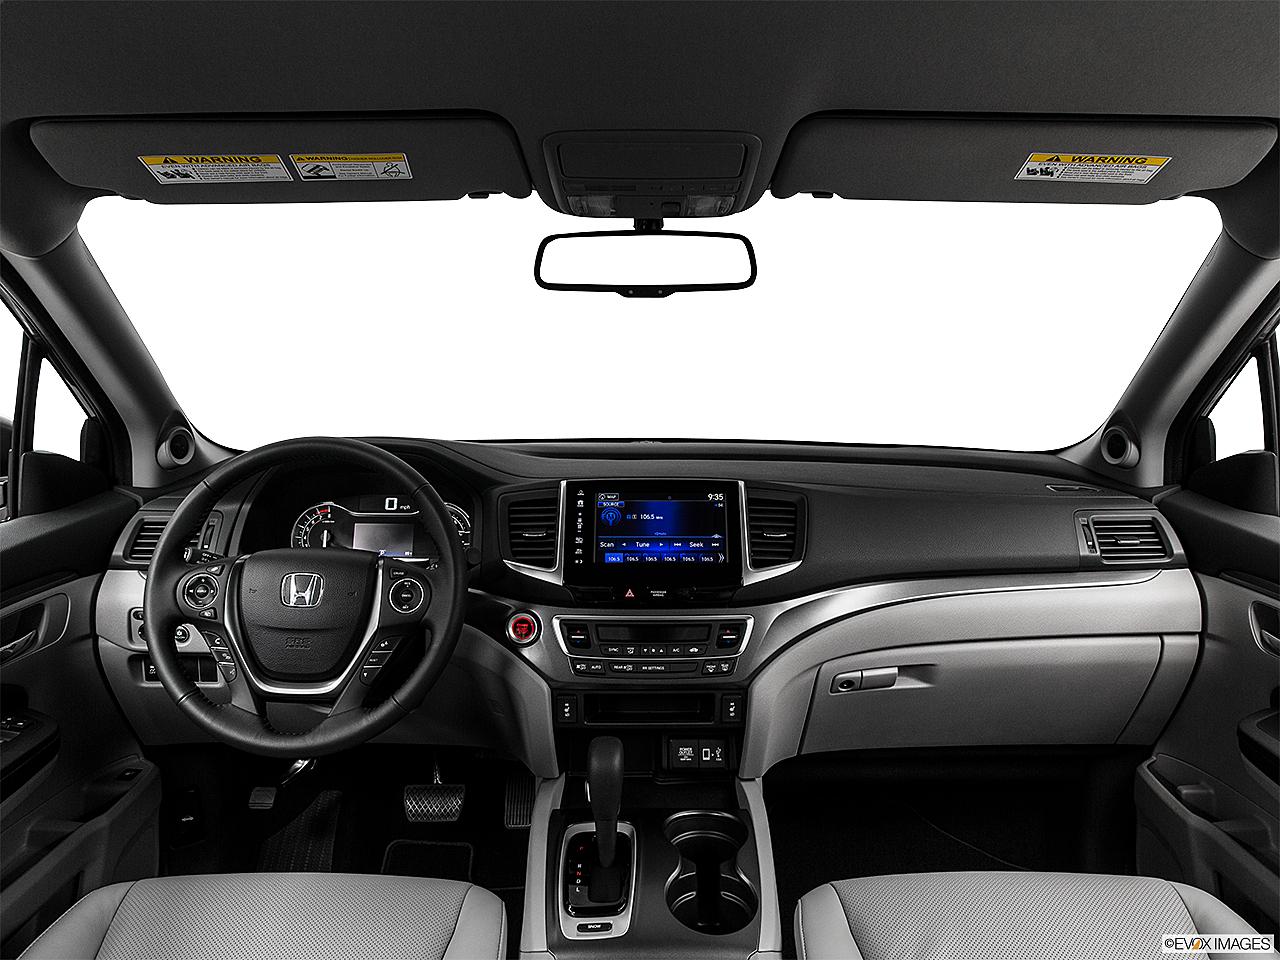 2017 Honda Ridgeline Awd Rtl E 4dr Crew Cab 5 3 Ft Sb Research Groovecar